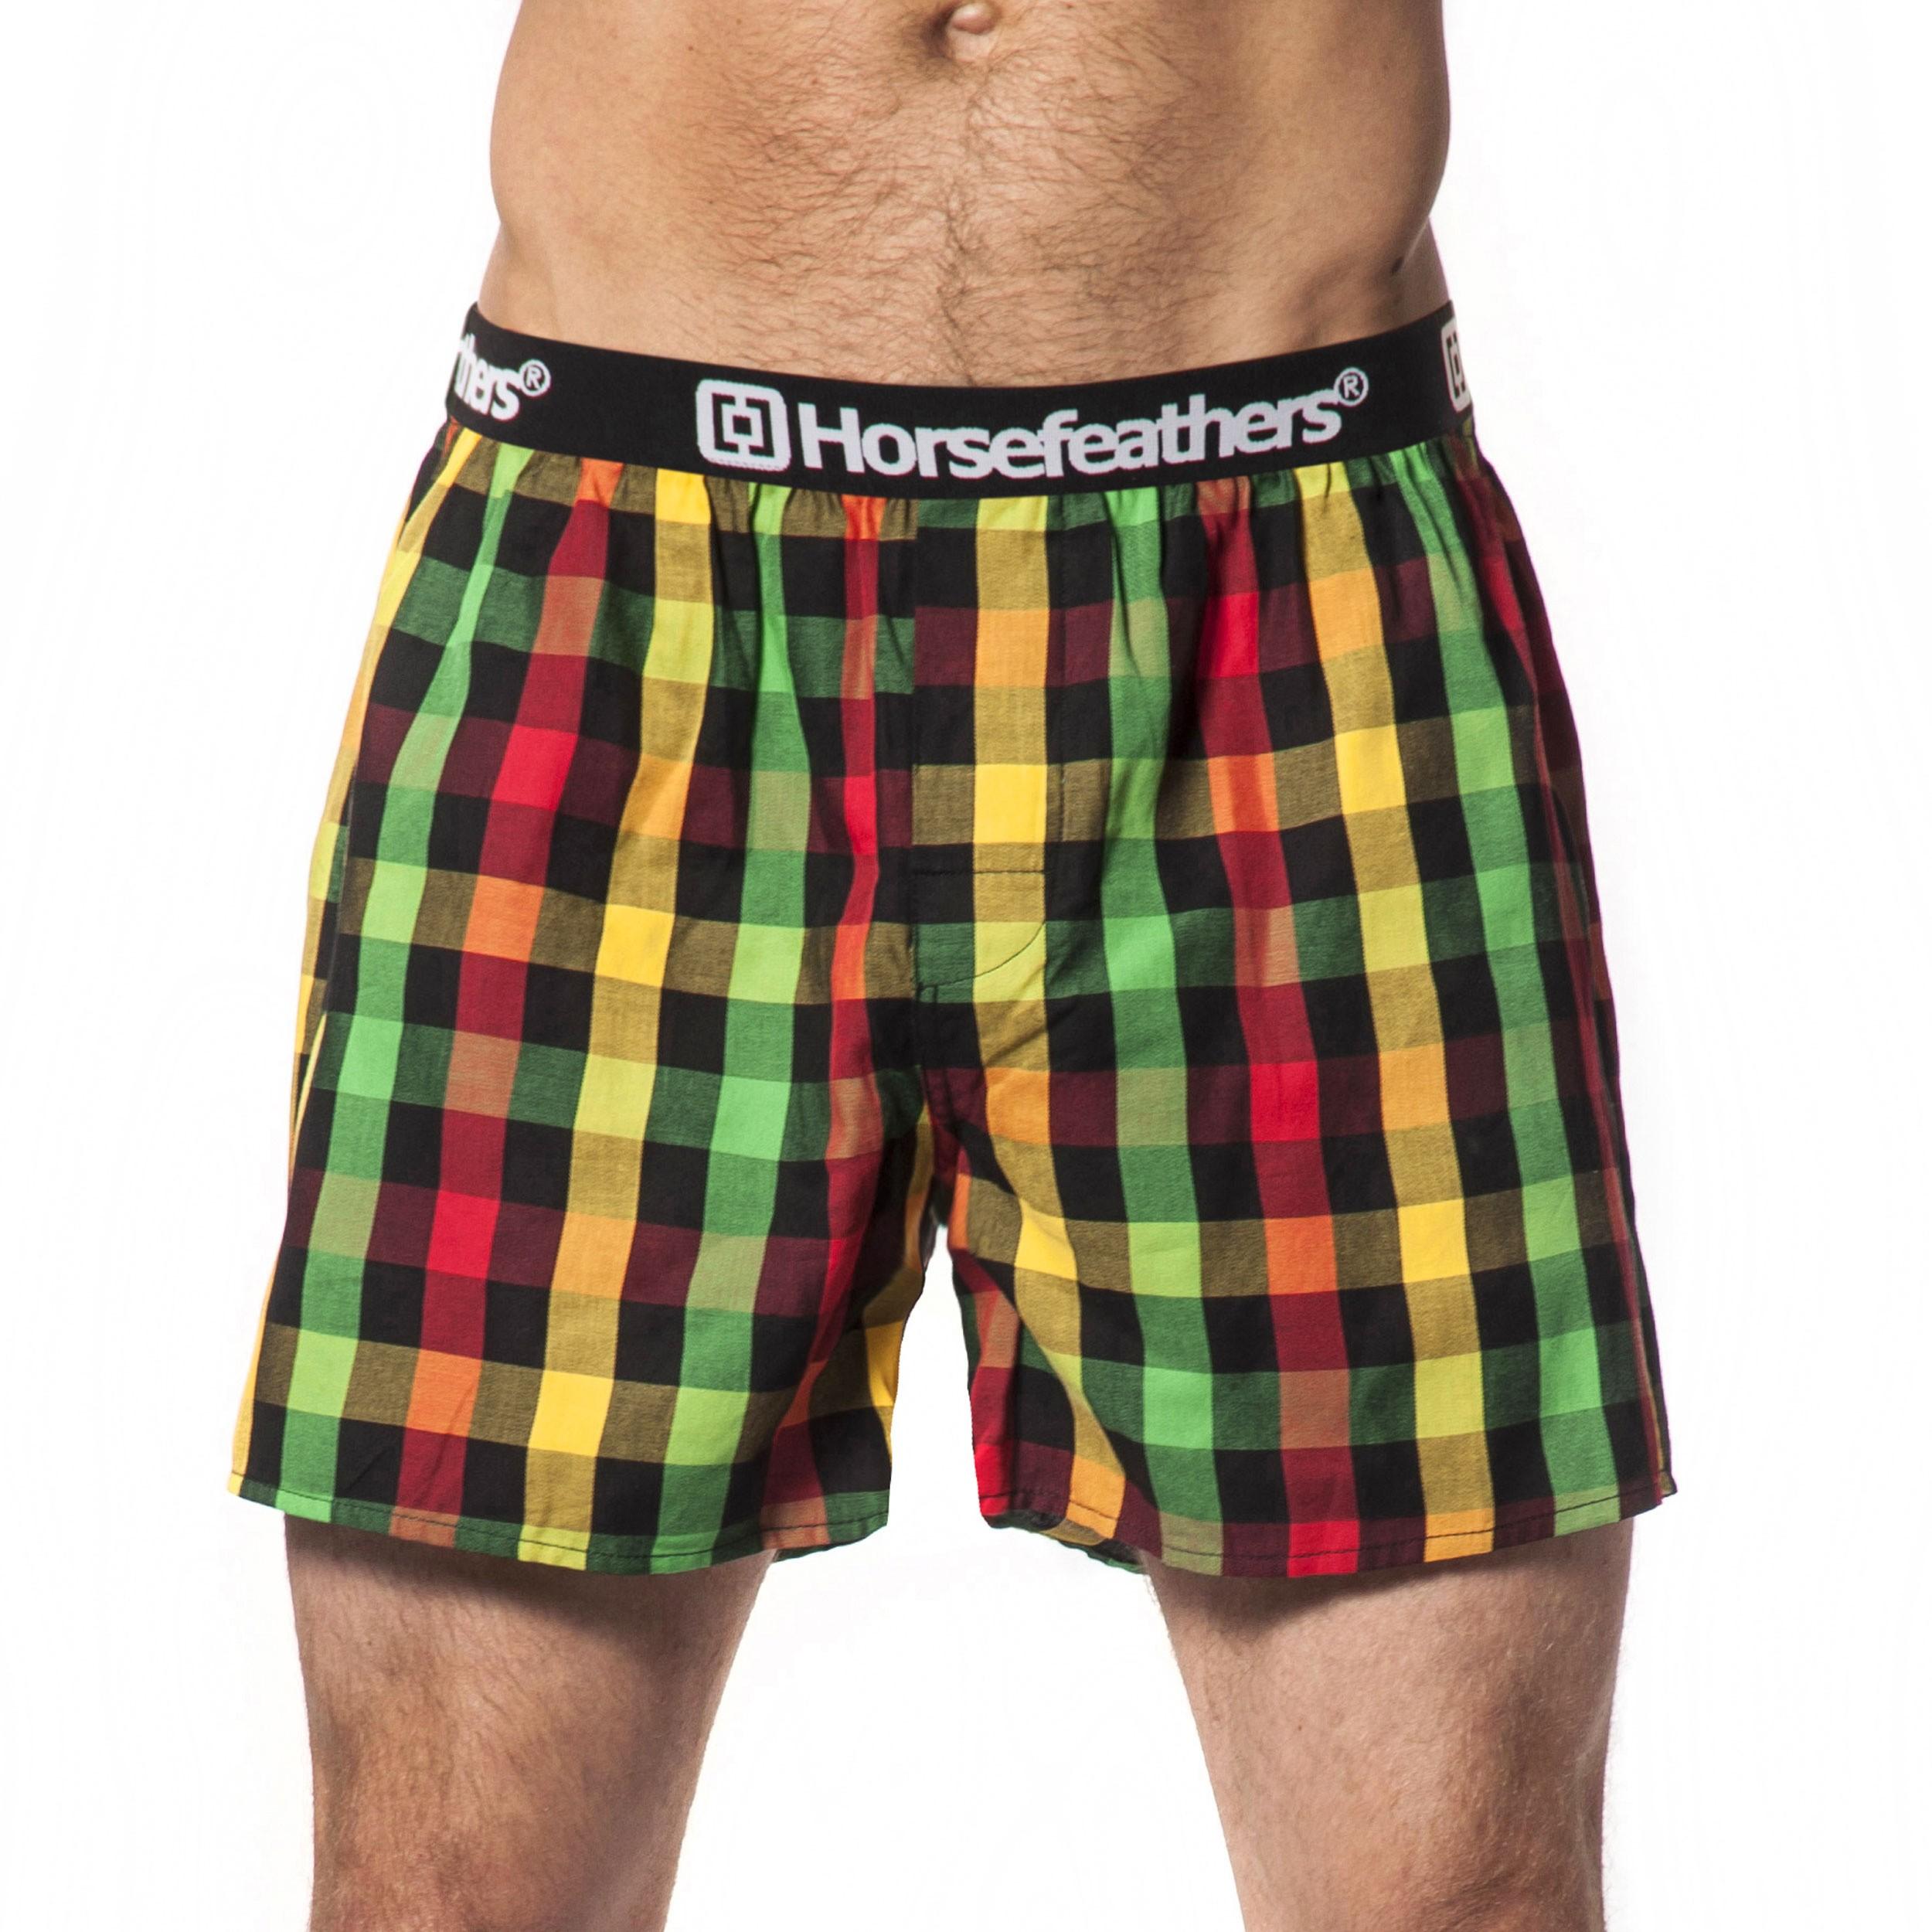 HORSEFEATHERS pánské červeno-žluto-zelené kostičkované trenýrky Apollo Boxer Shorts RASTA